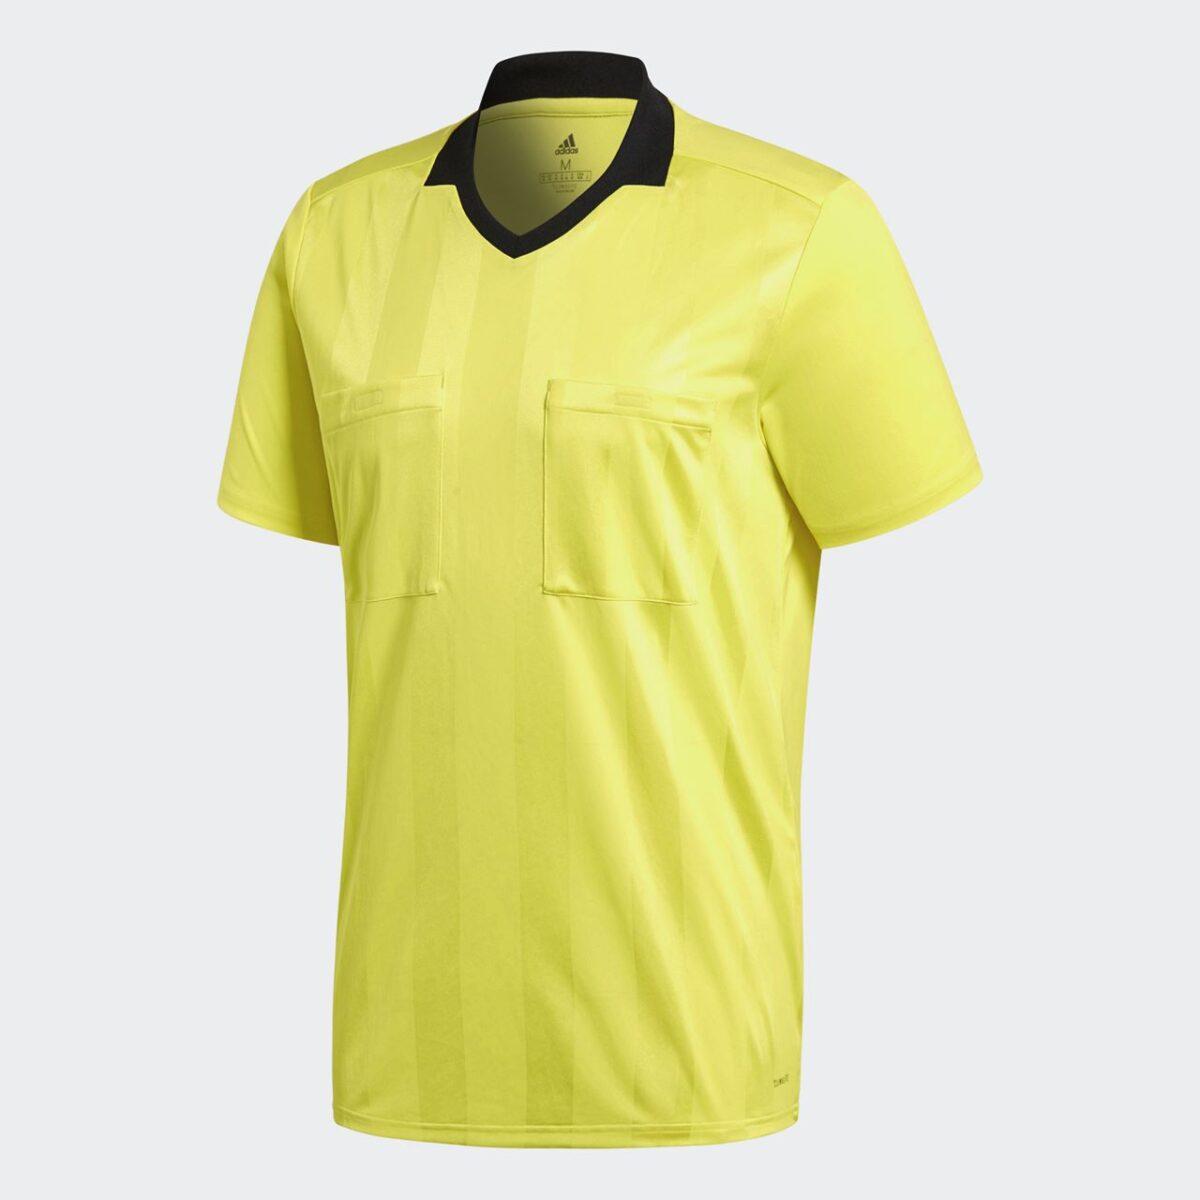 Adidas Referee Shirts S/S